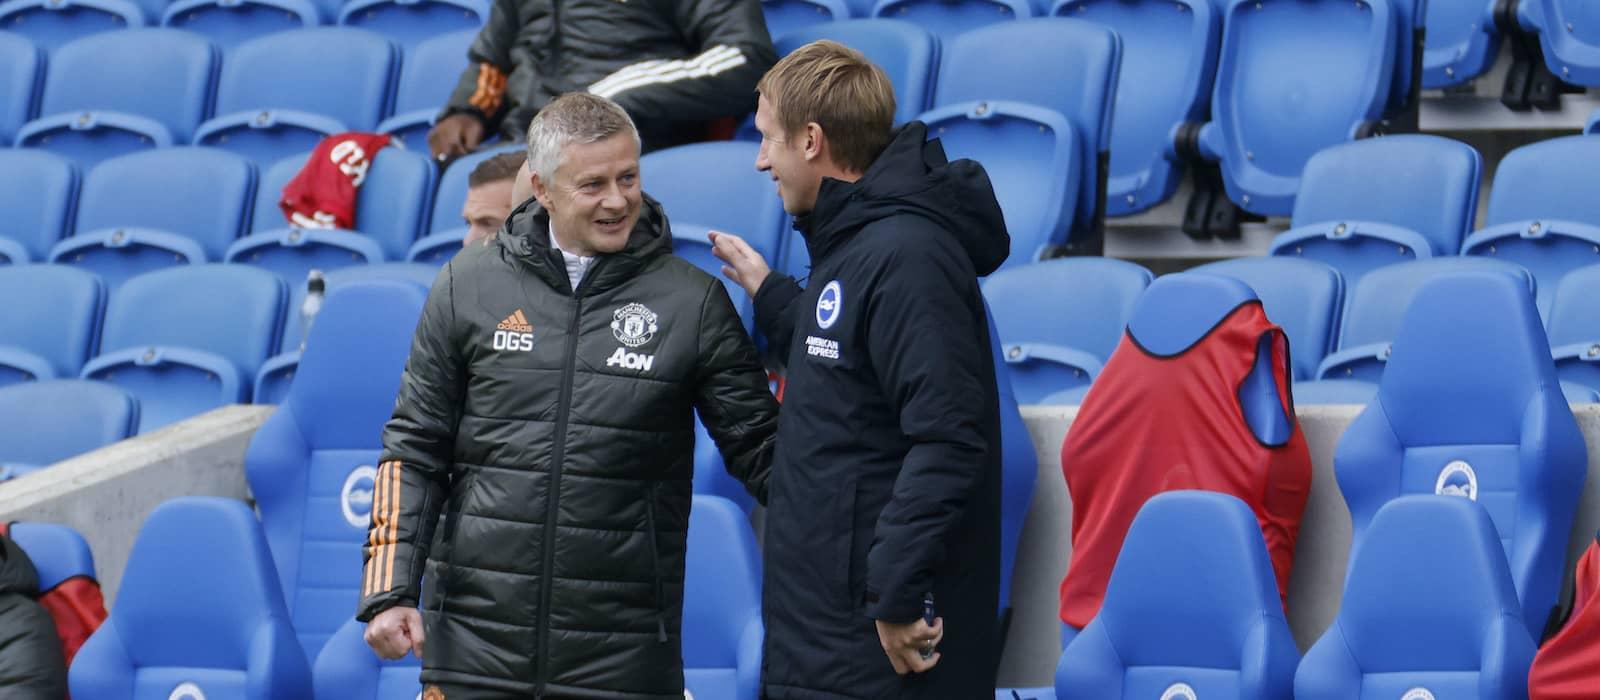 Fans start to turn on Ole Gunnar Solskjaer at Manchester United